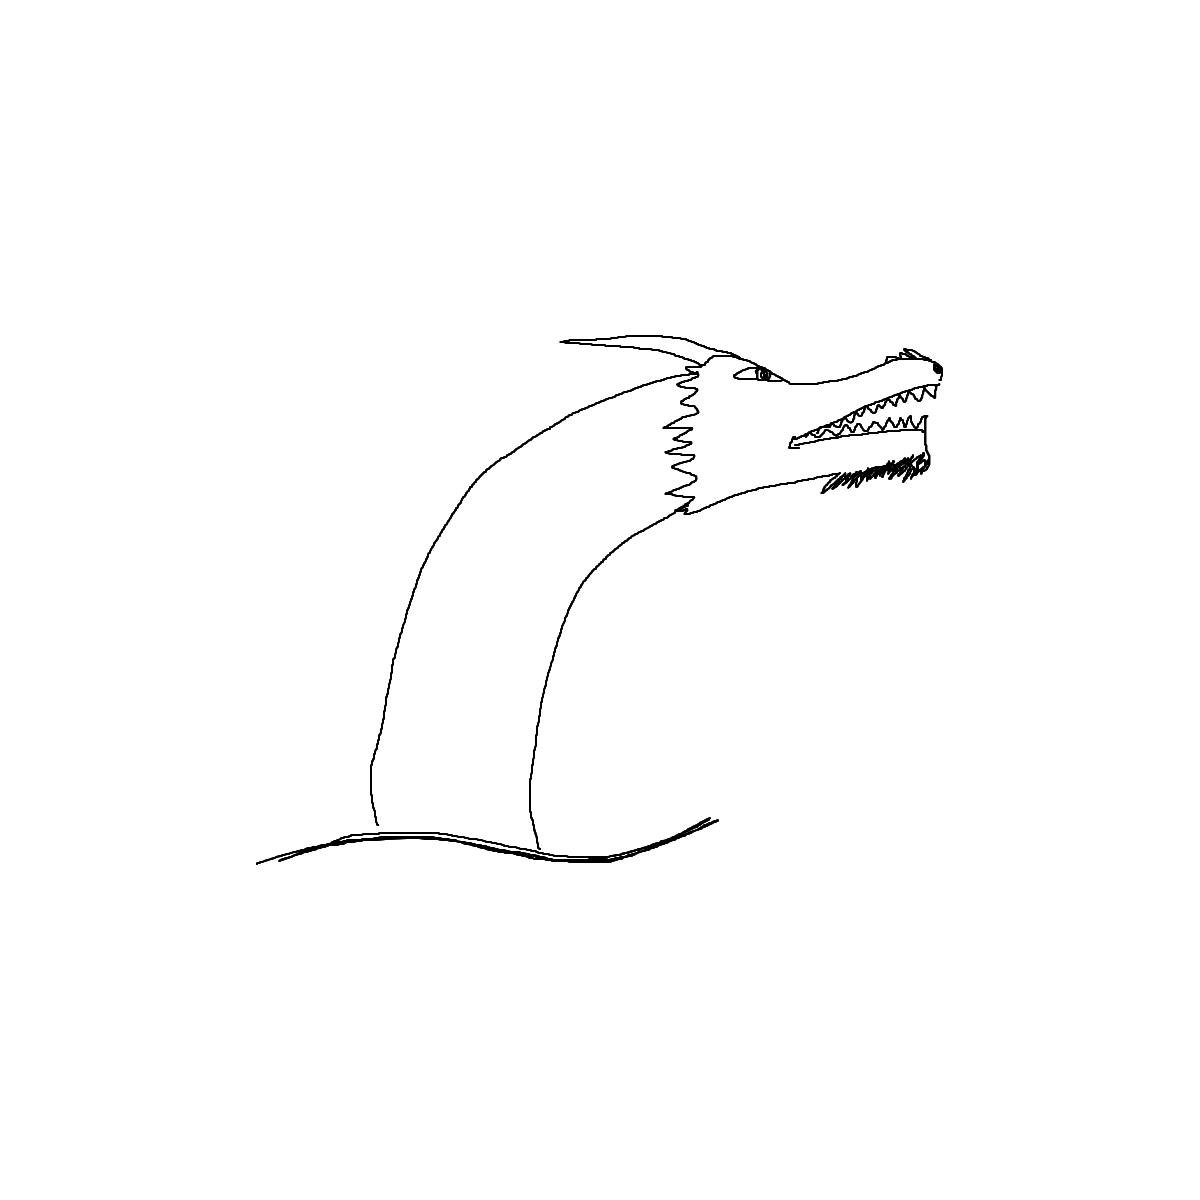 BAAAM drawing#2256 lat:43.4005355834960940lng: -1.7704223394393920